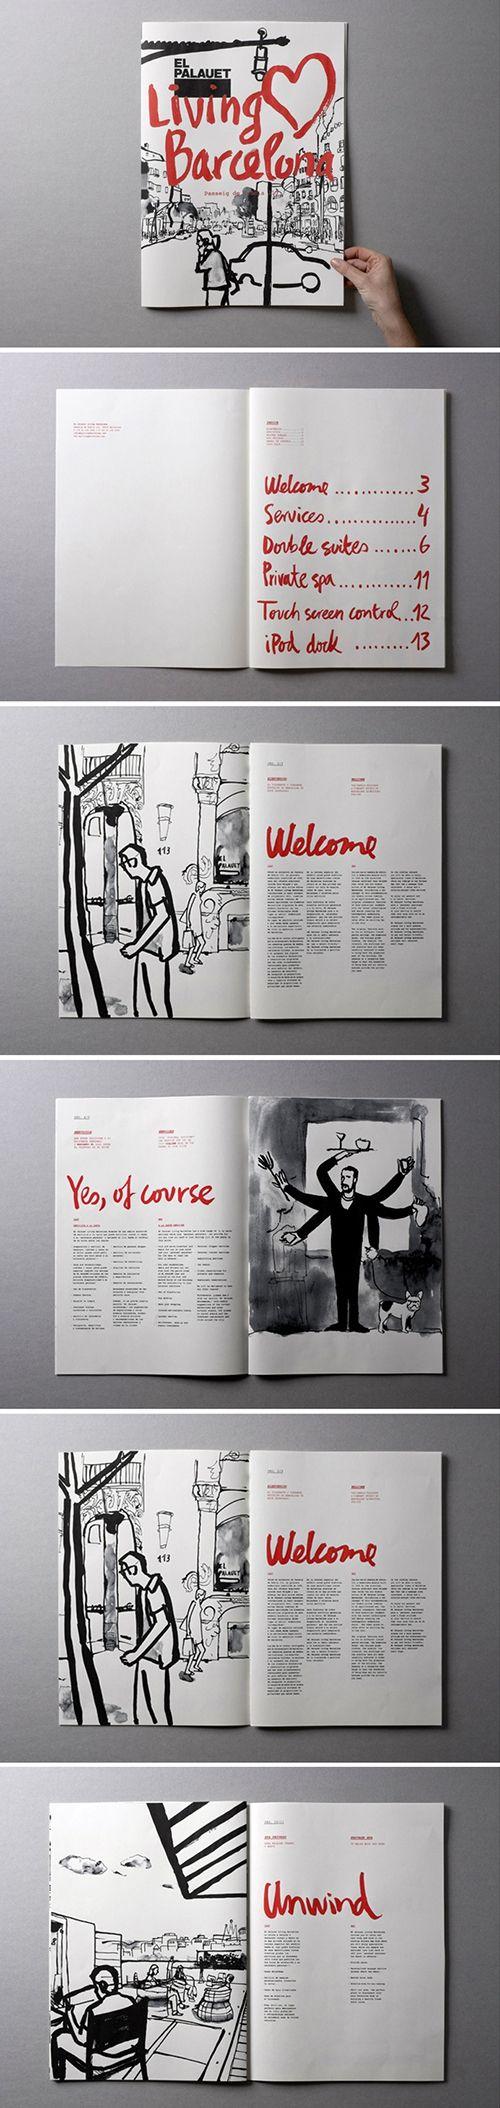 Living Barcelona brochure